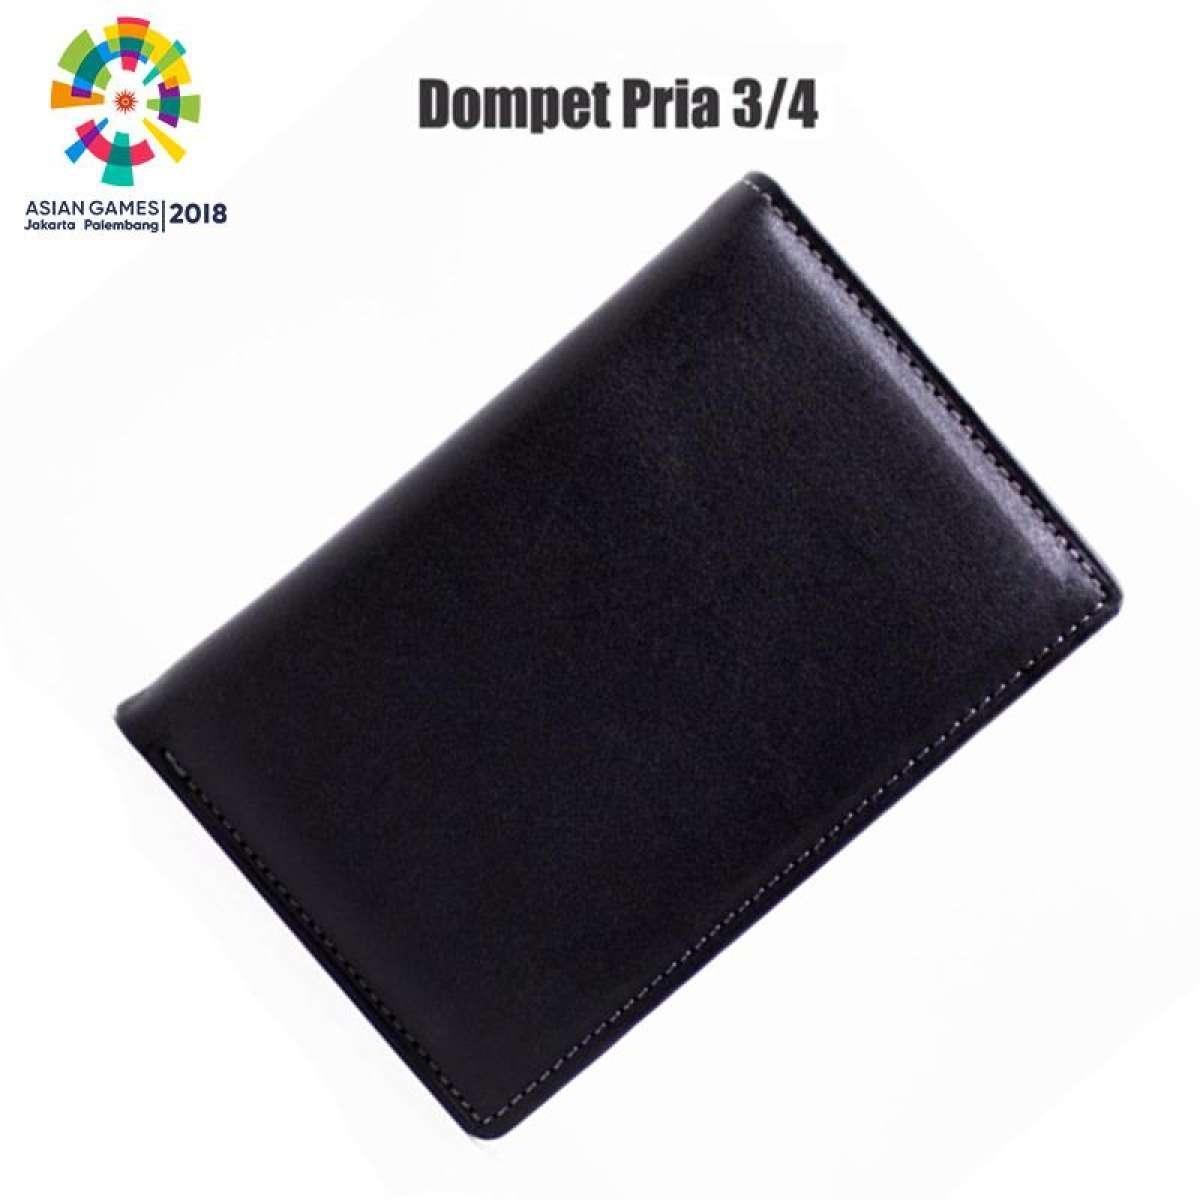 Dompet Kulit Pria 3 Dimensi Asli Garut 100 Original Model 4 Black